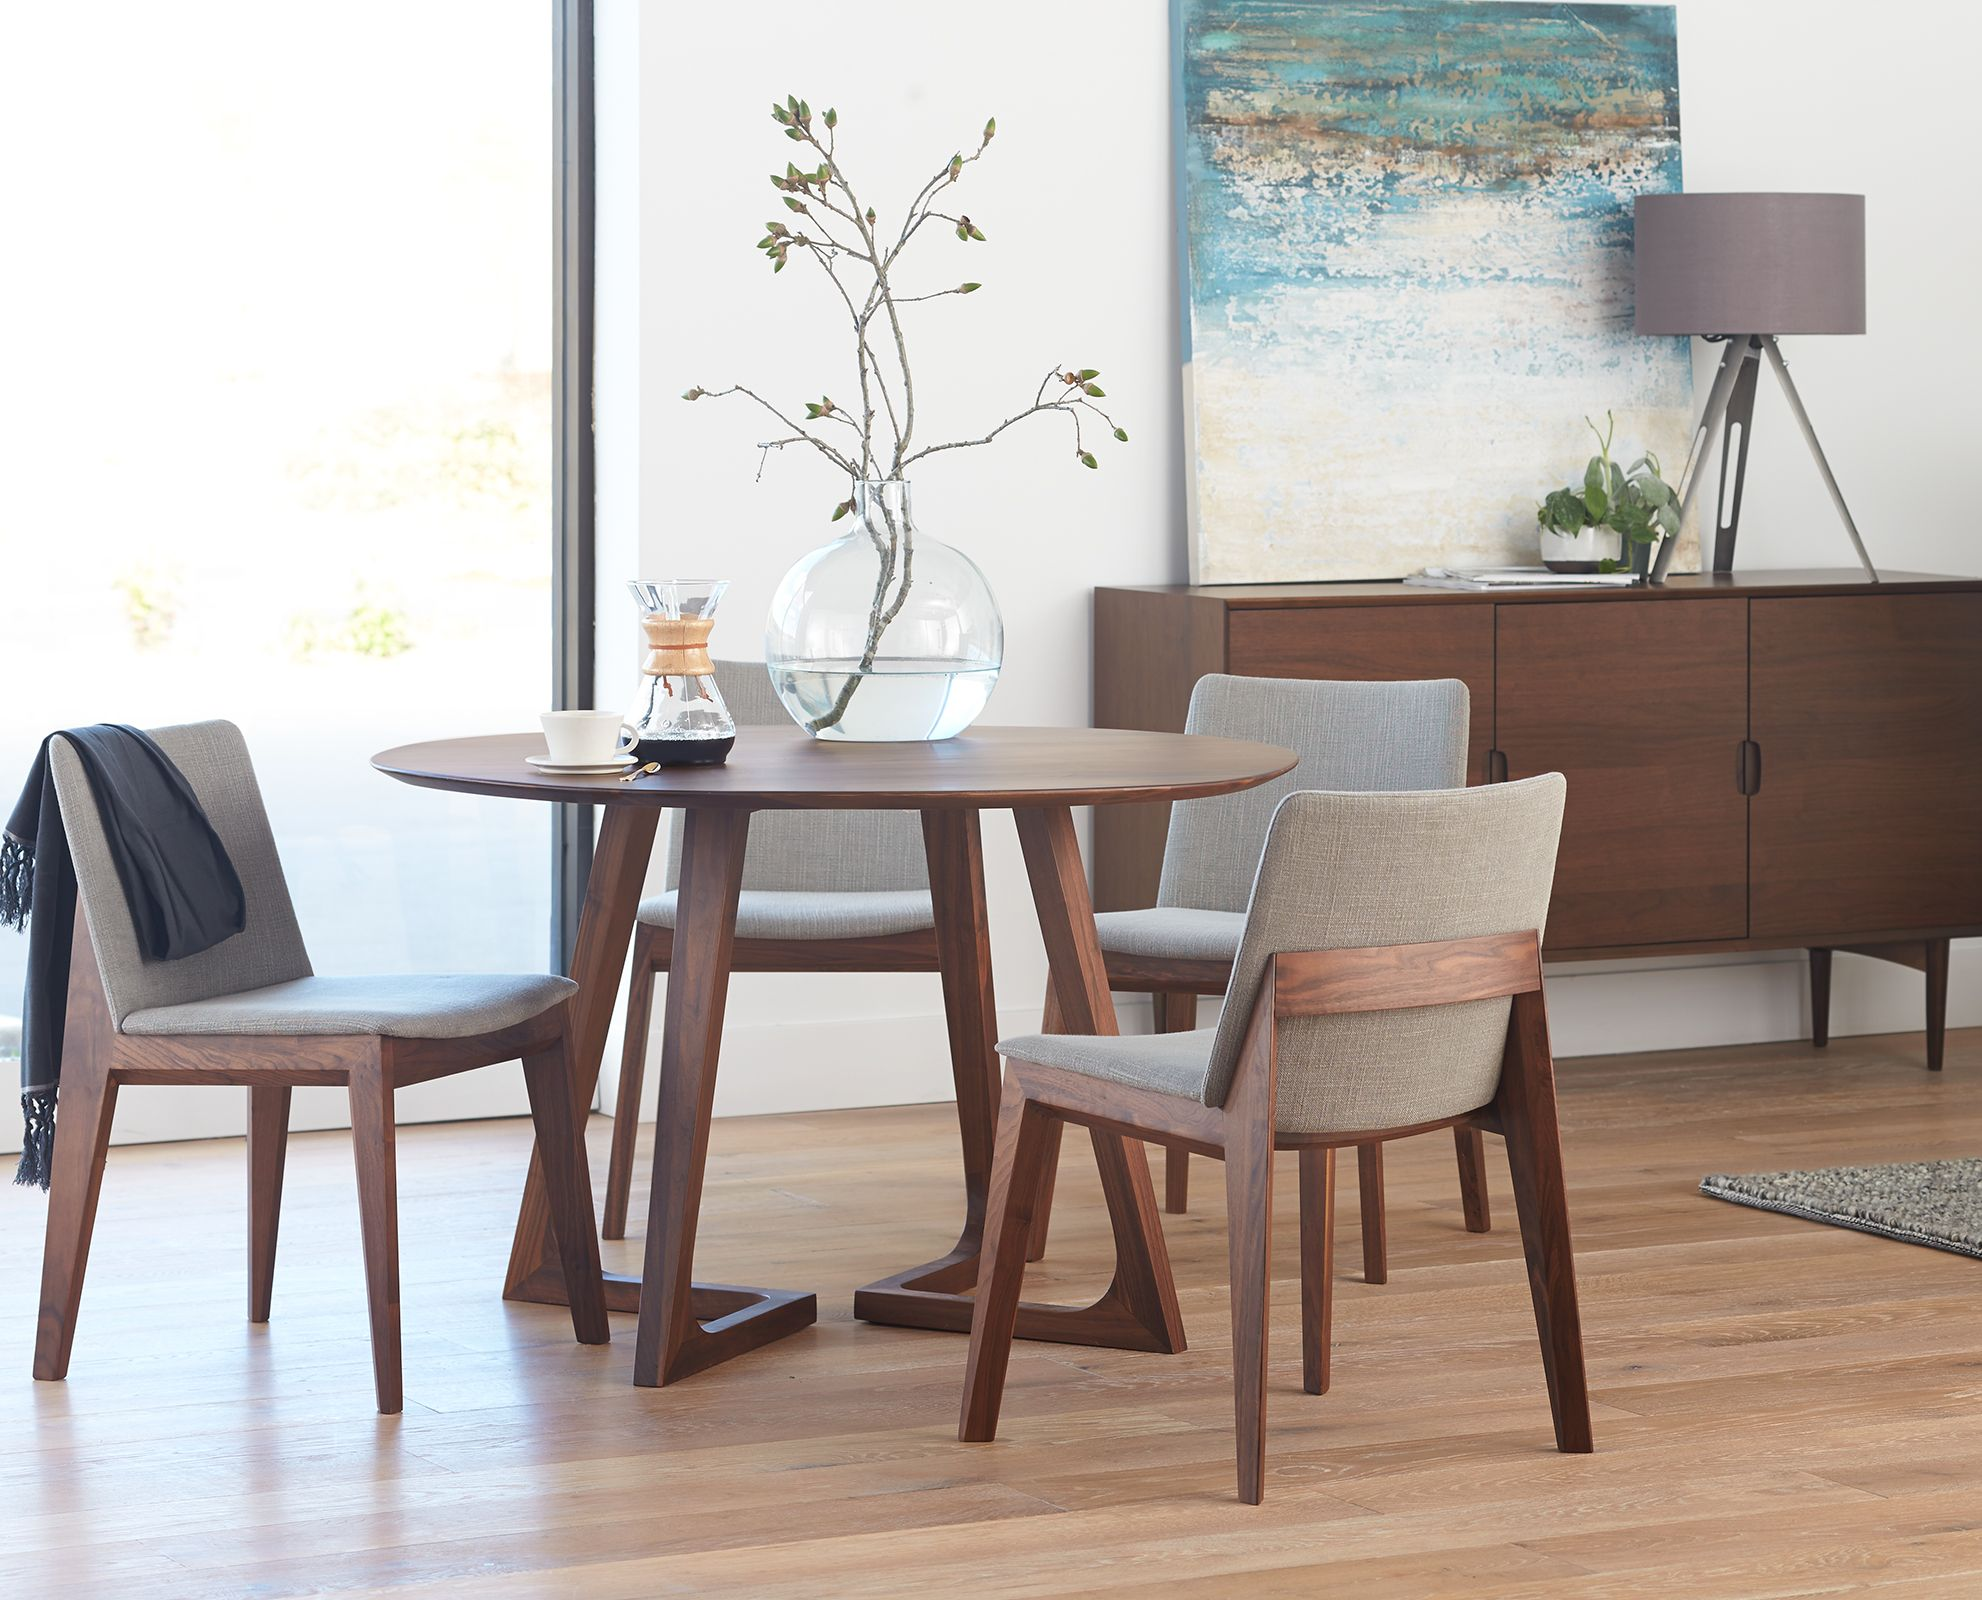 Curated Design 2 Dining Room Decor Ideas Scandinavian Dining